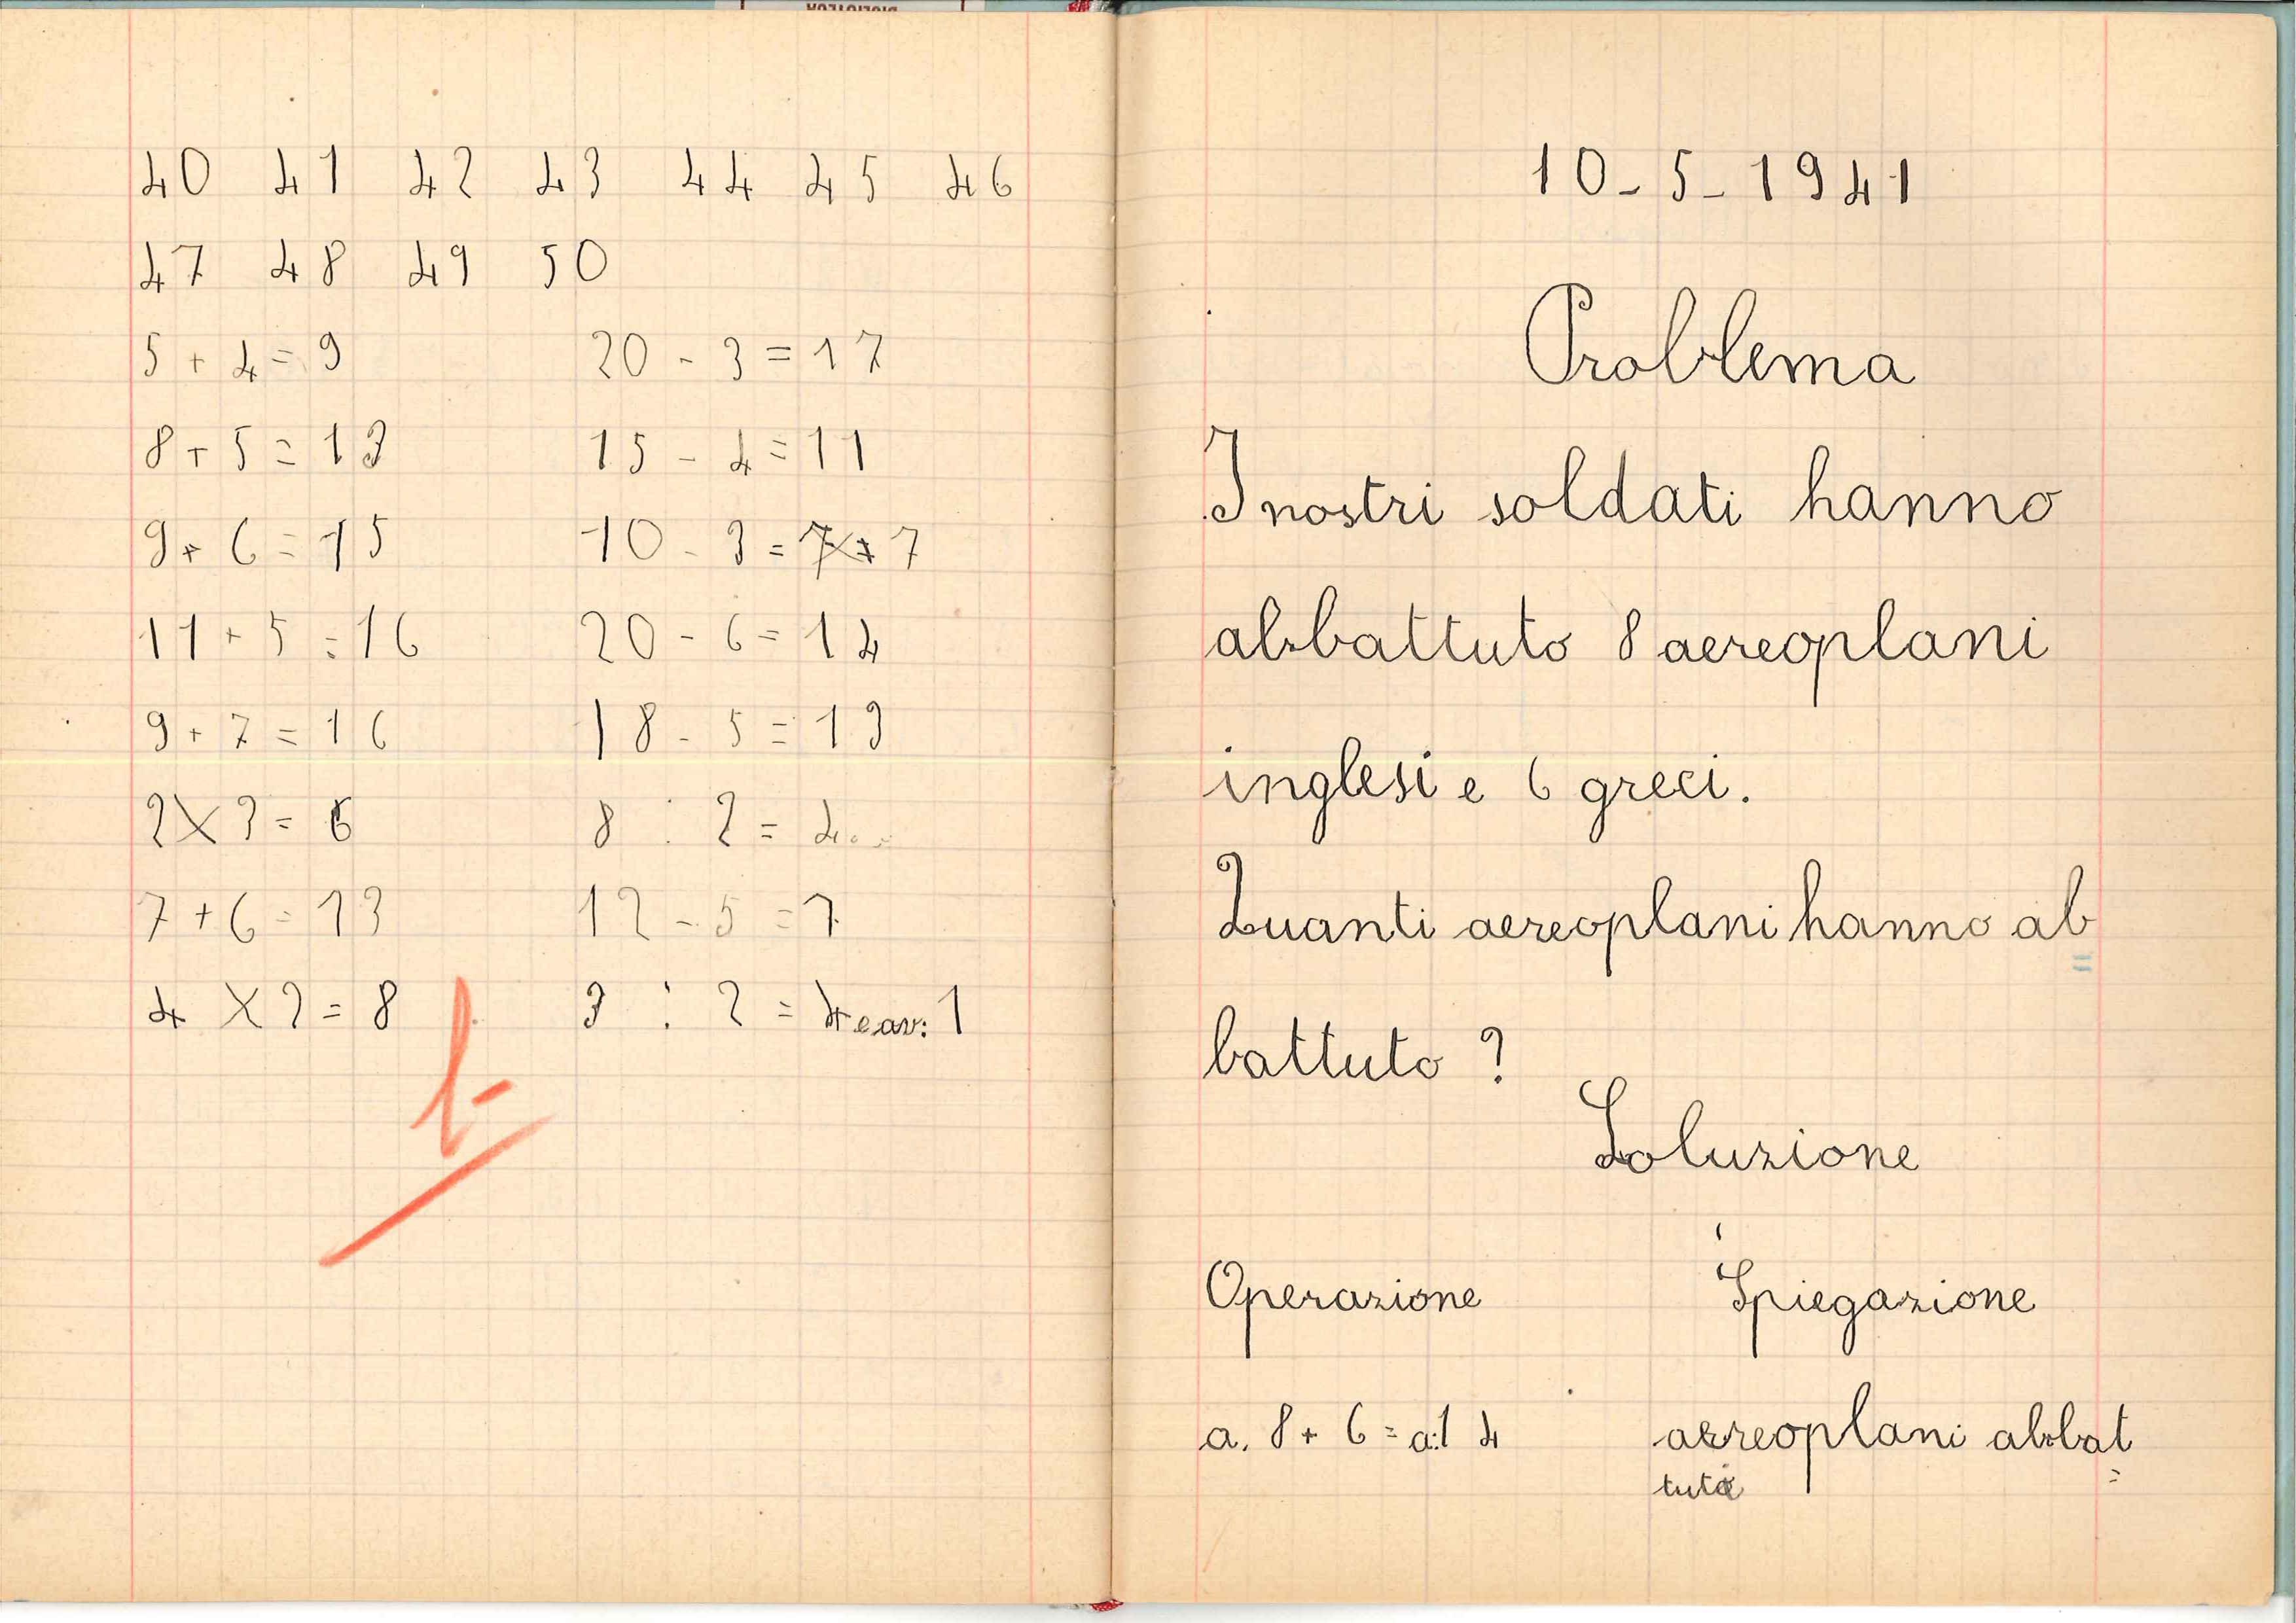 Un'esperienza di didattica laboratoriale: la mostra Firenze in guerra 1940-1944